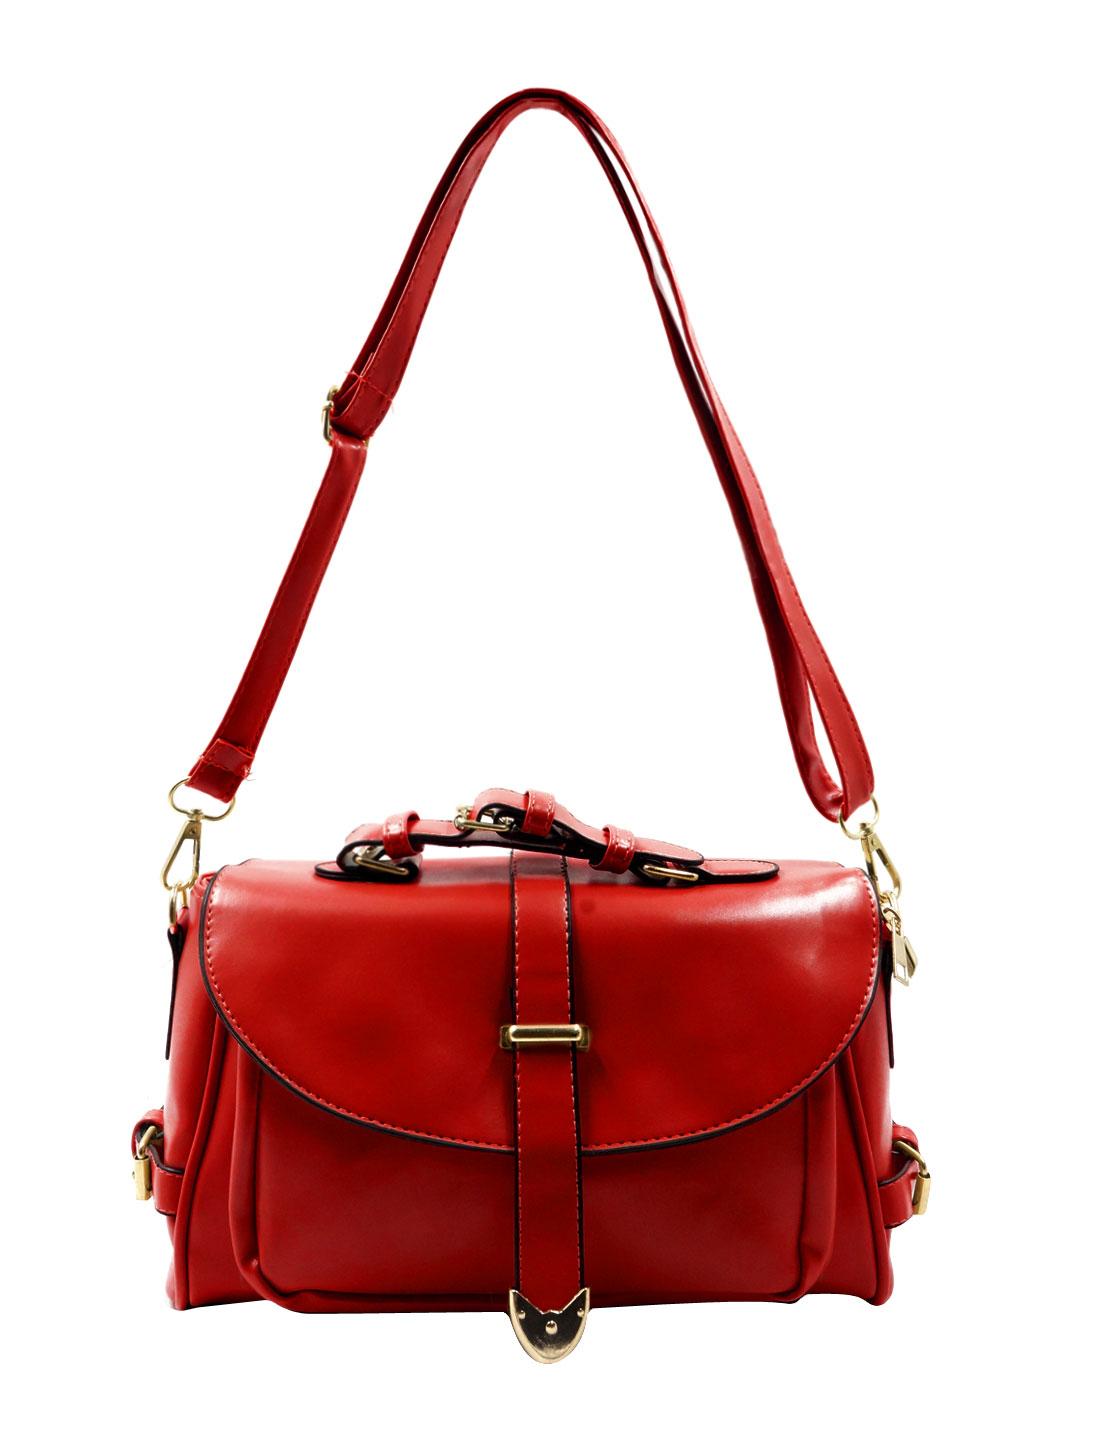 Woman Imiatation Leather Multi-Pockets Crossbody Shoulder Bag Red